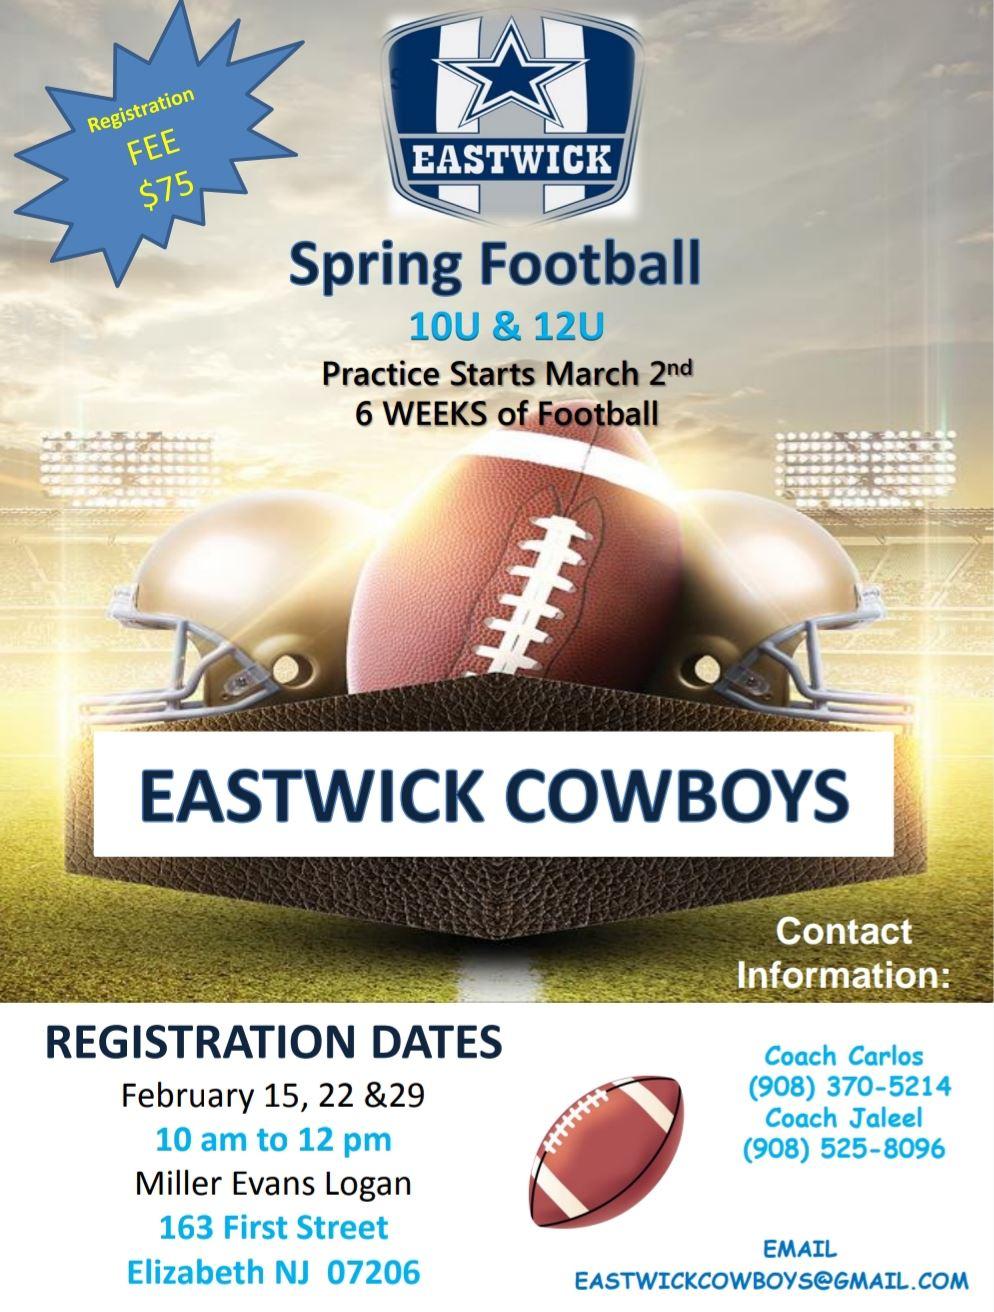 Eastwick Cowboys